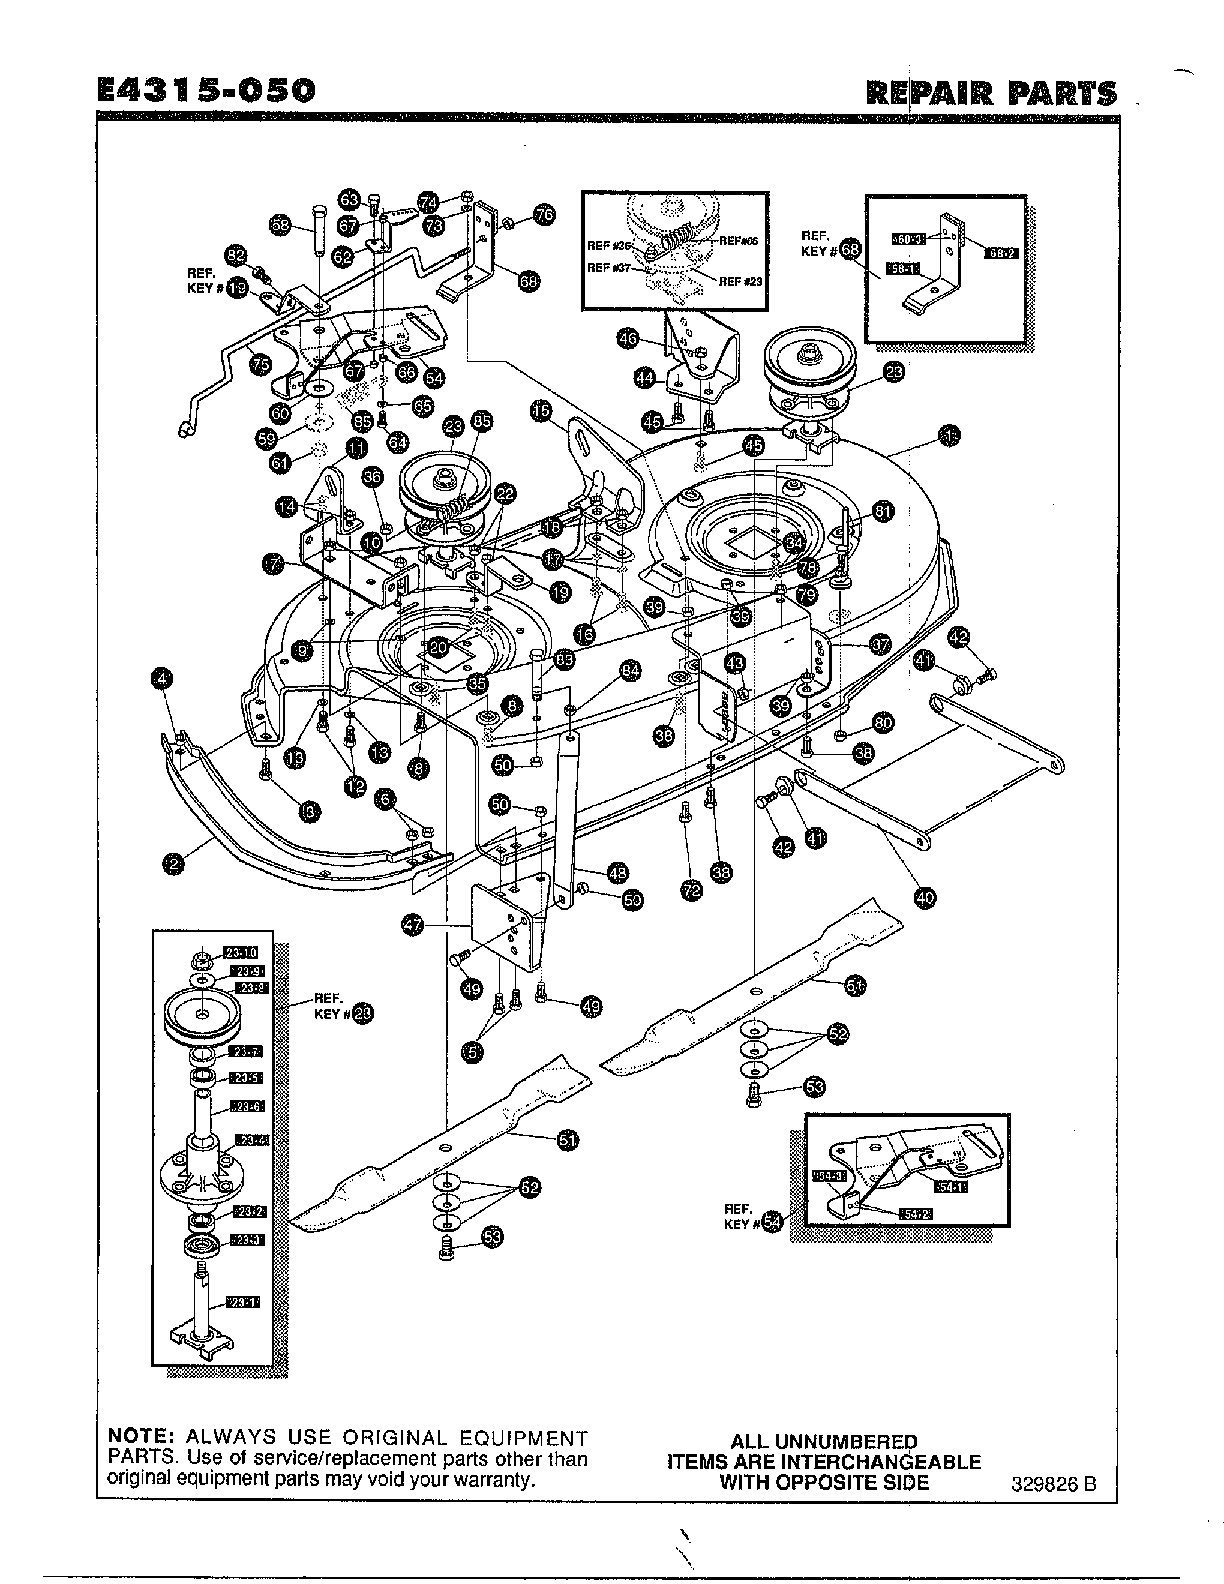 Noma model e4315 050 lawn tractor genuine parts rh searspartsdirect 1987 mazda b2000 vacuum hose diagram vlan ex le diagrams